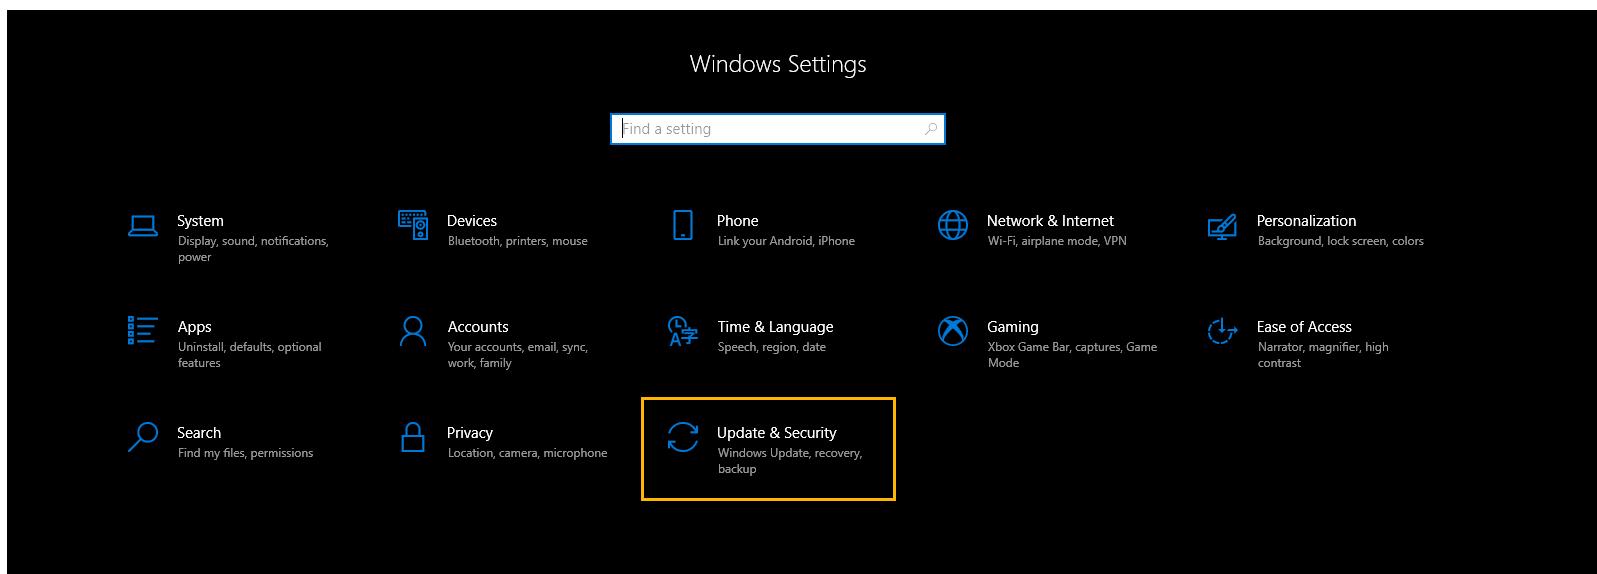 A screenshot of Windows 10's settings window. Update & Security is circled.